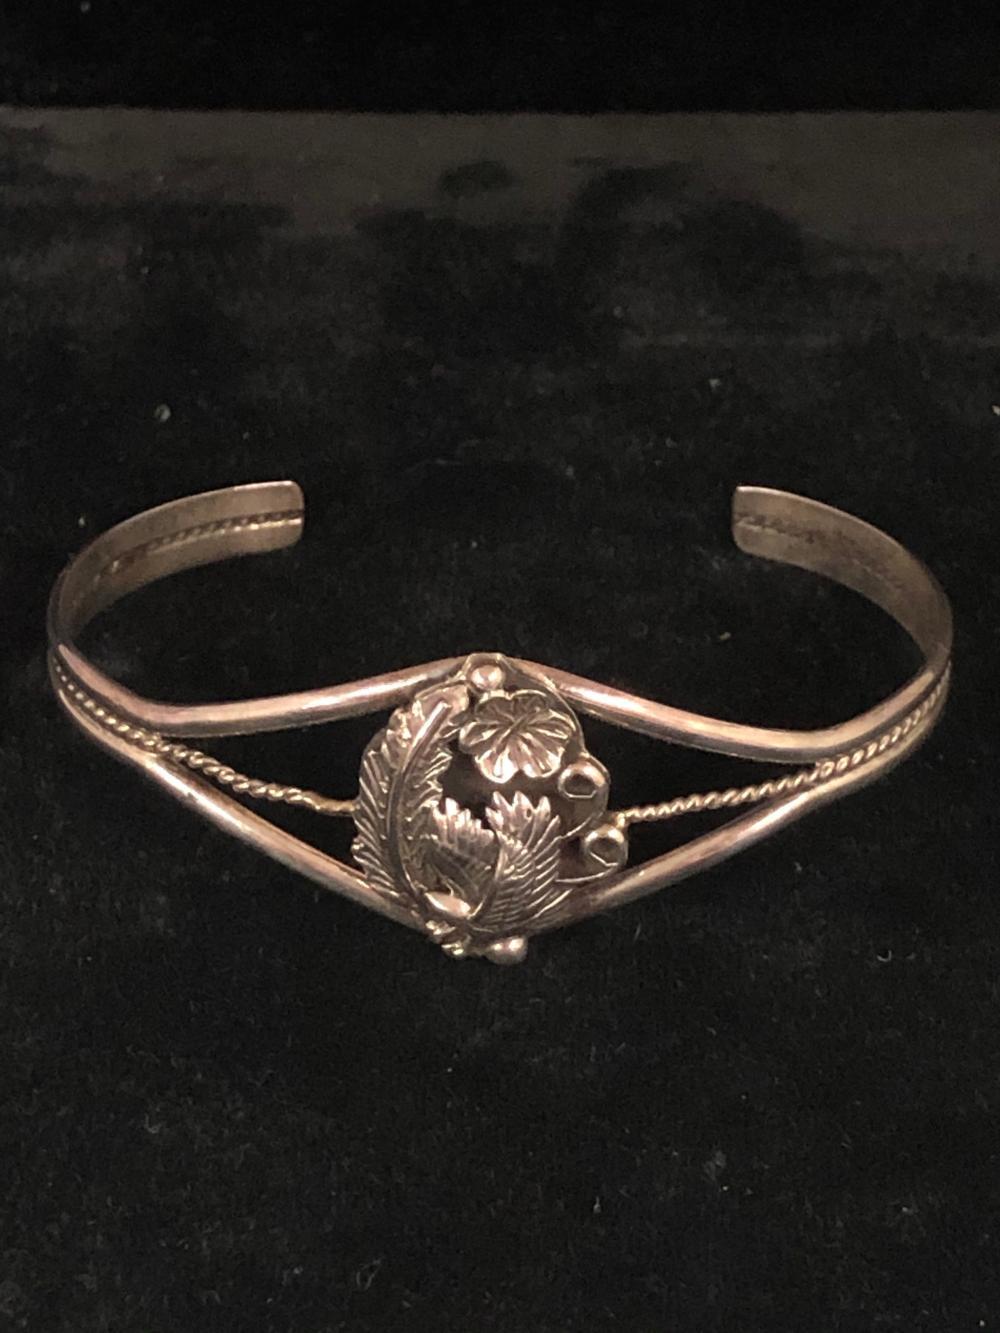 Eagle & feather design sterling silver cuff bracelet